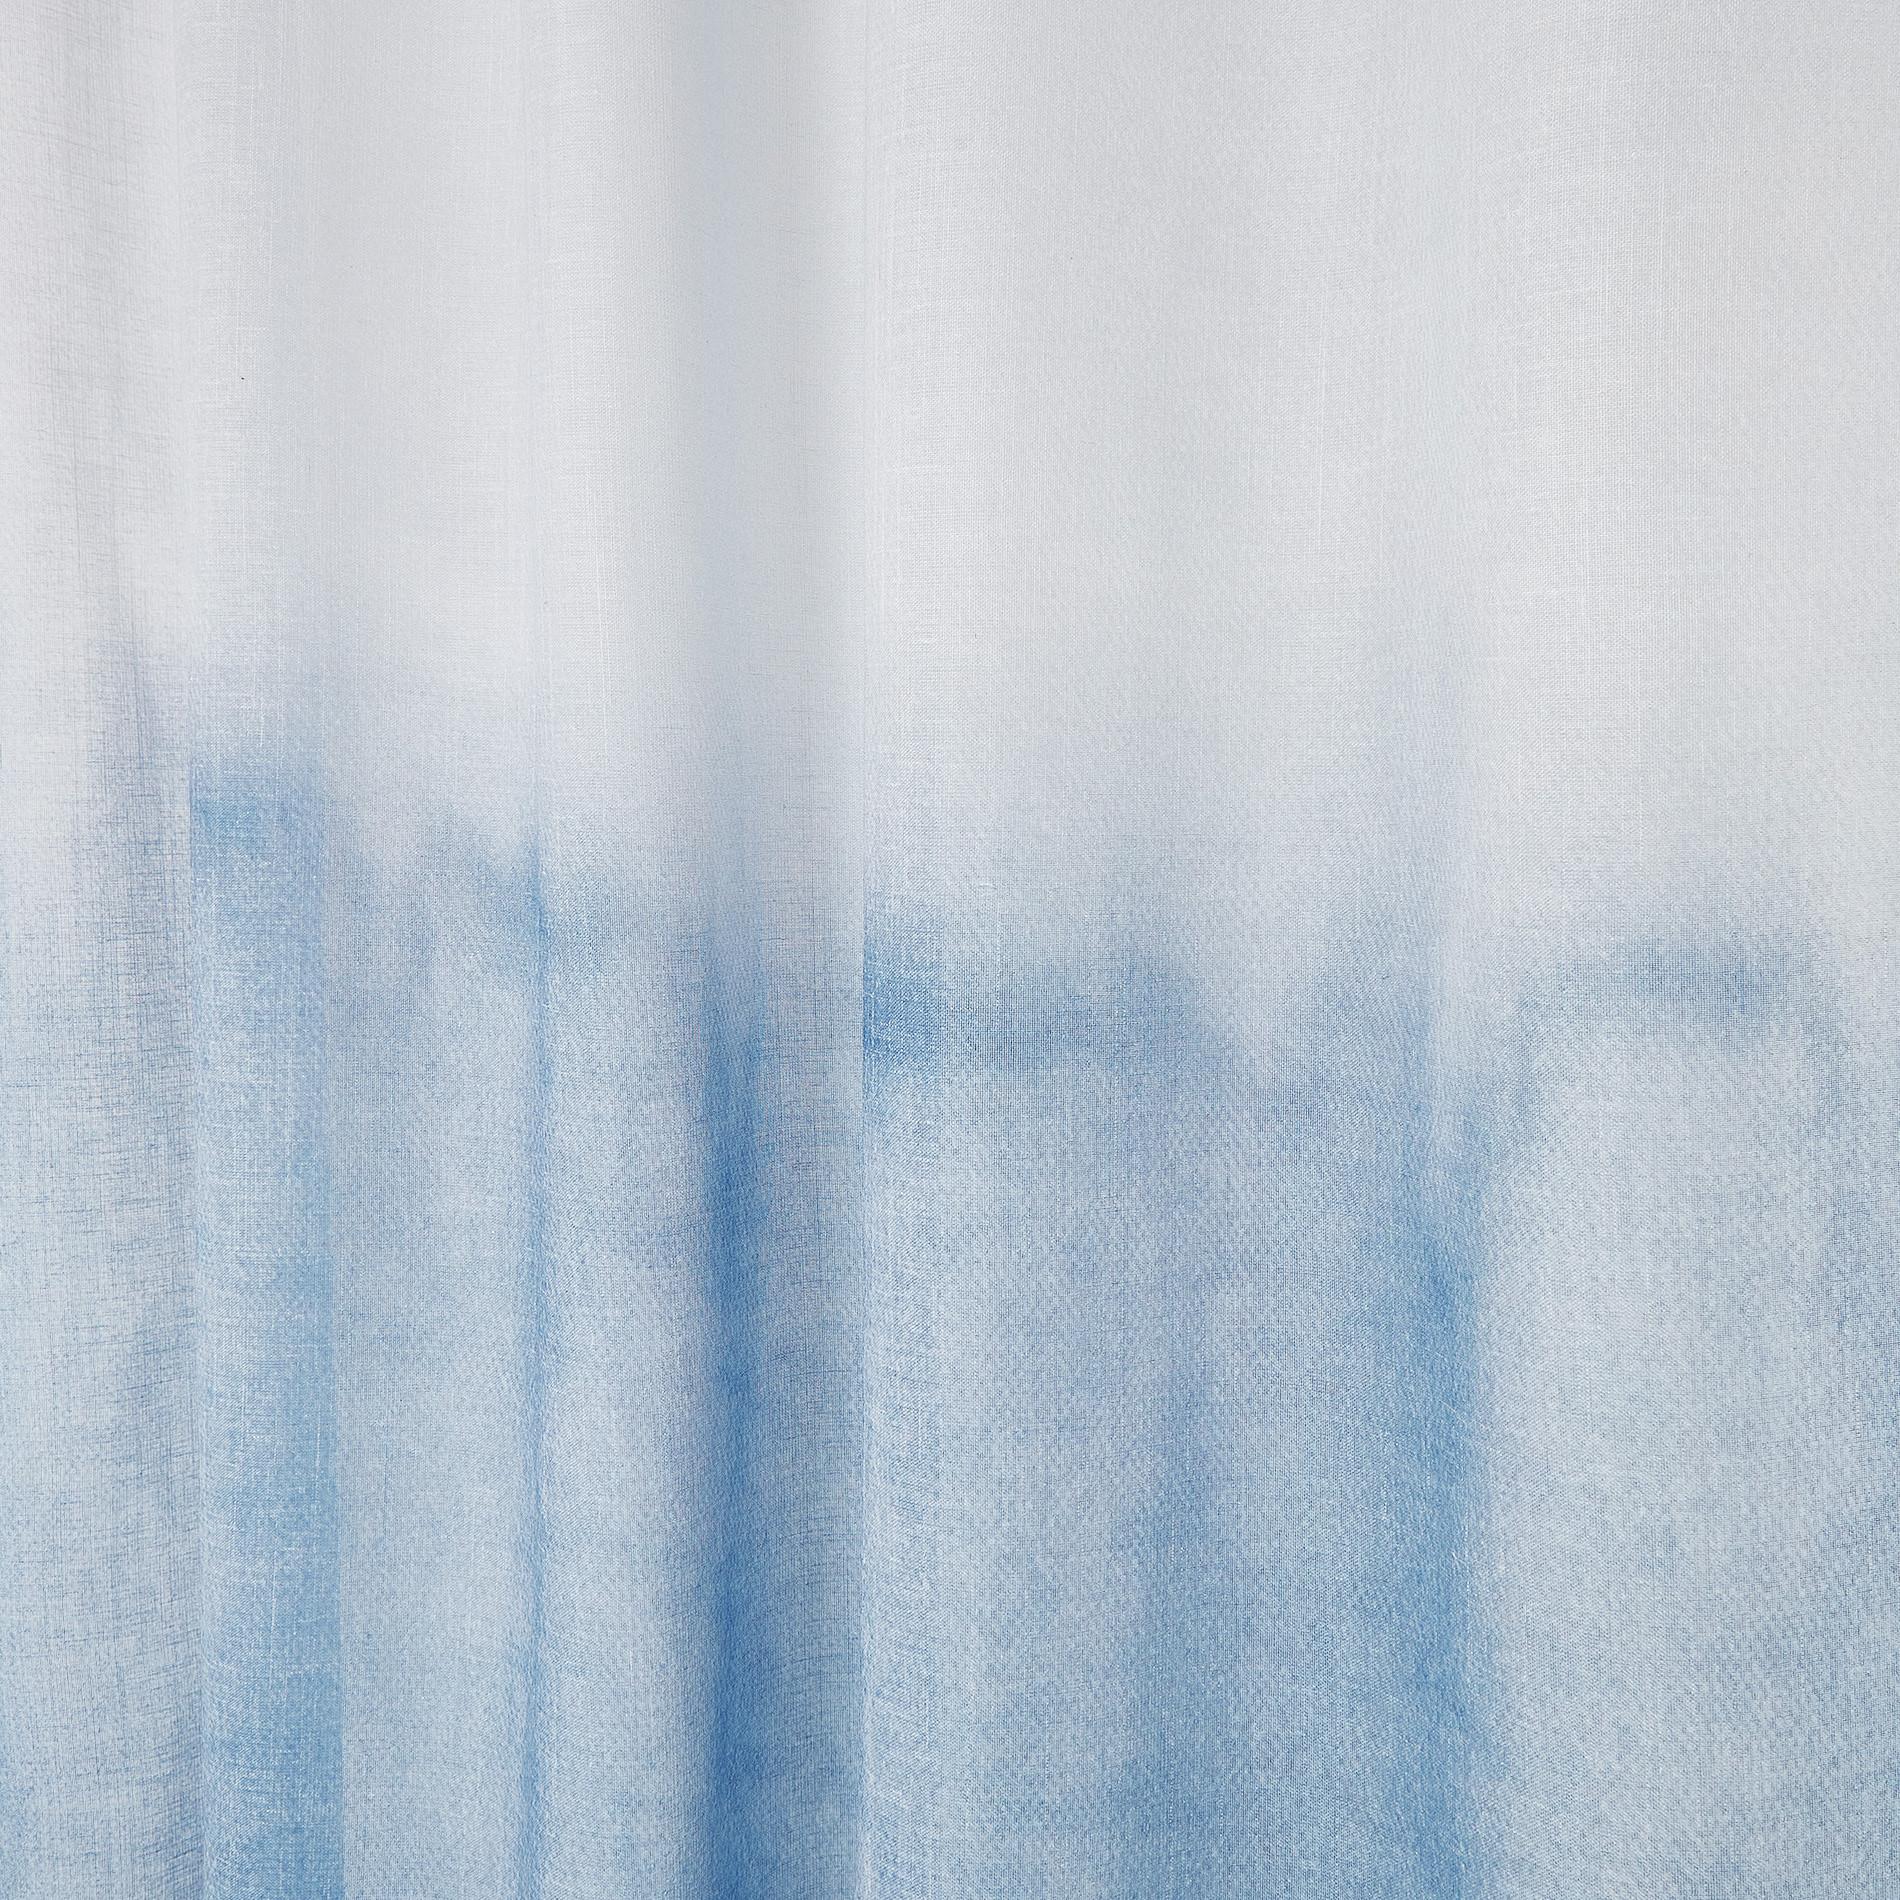 Tenda tessuto sfumato passanti nascosti, Azzurro, large image number 3